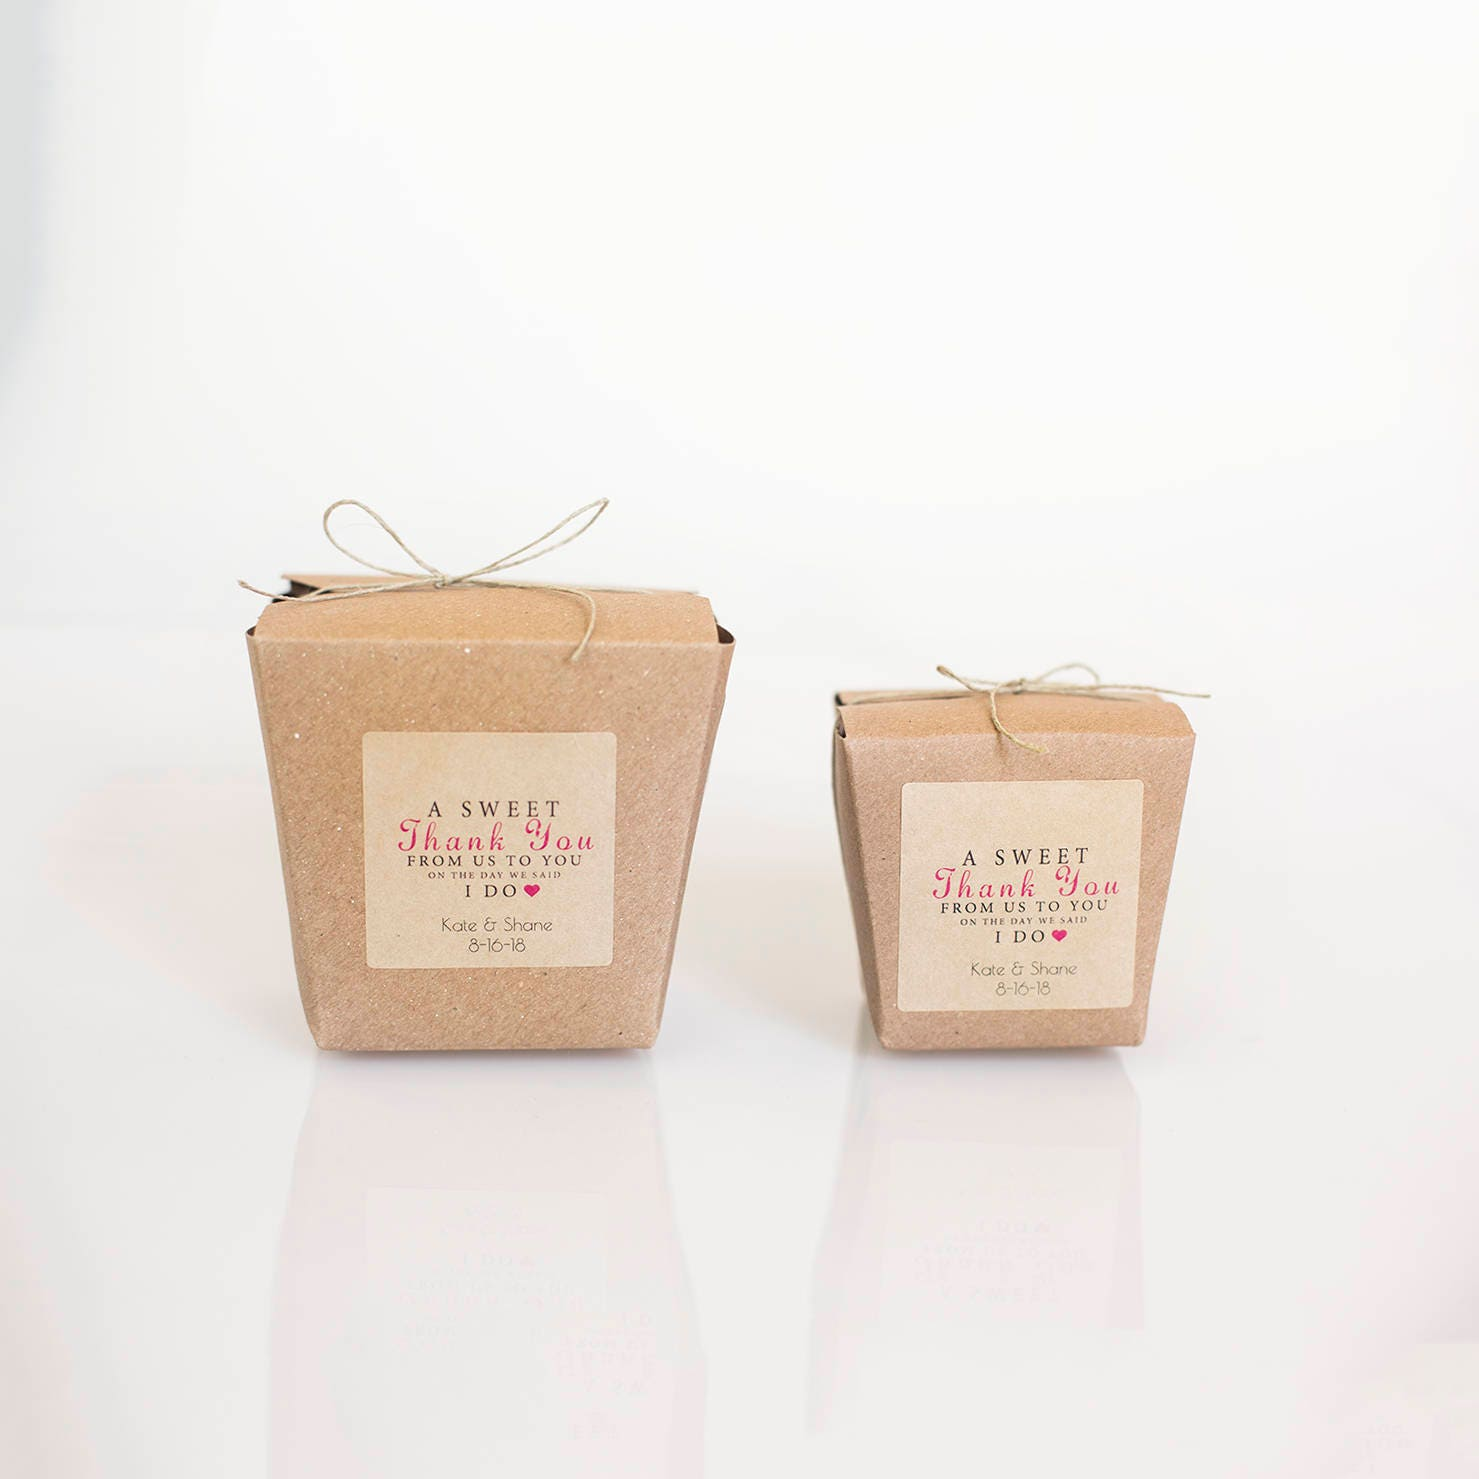 8oz or 16 oz Chinese Take out Boxes |Set of 150| Brown Kraft 100 ...